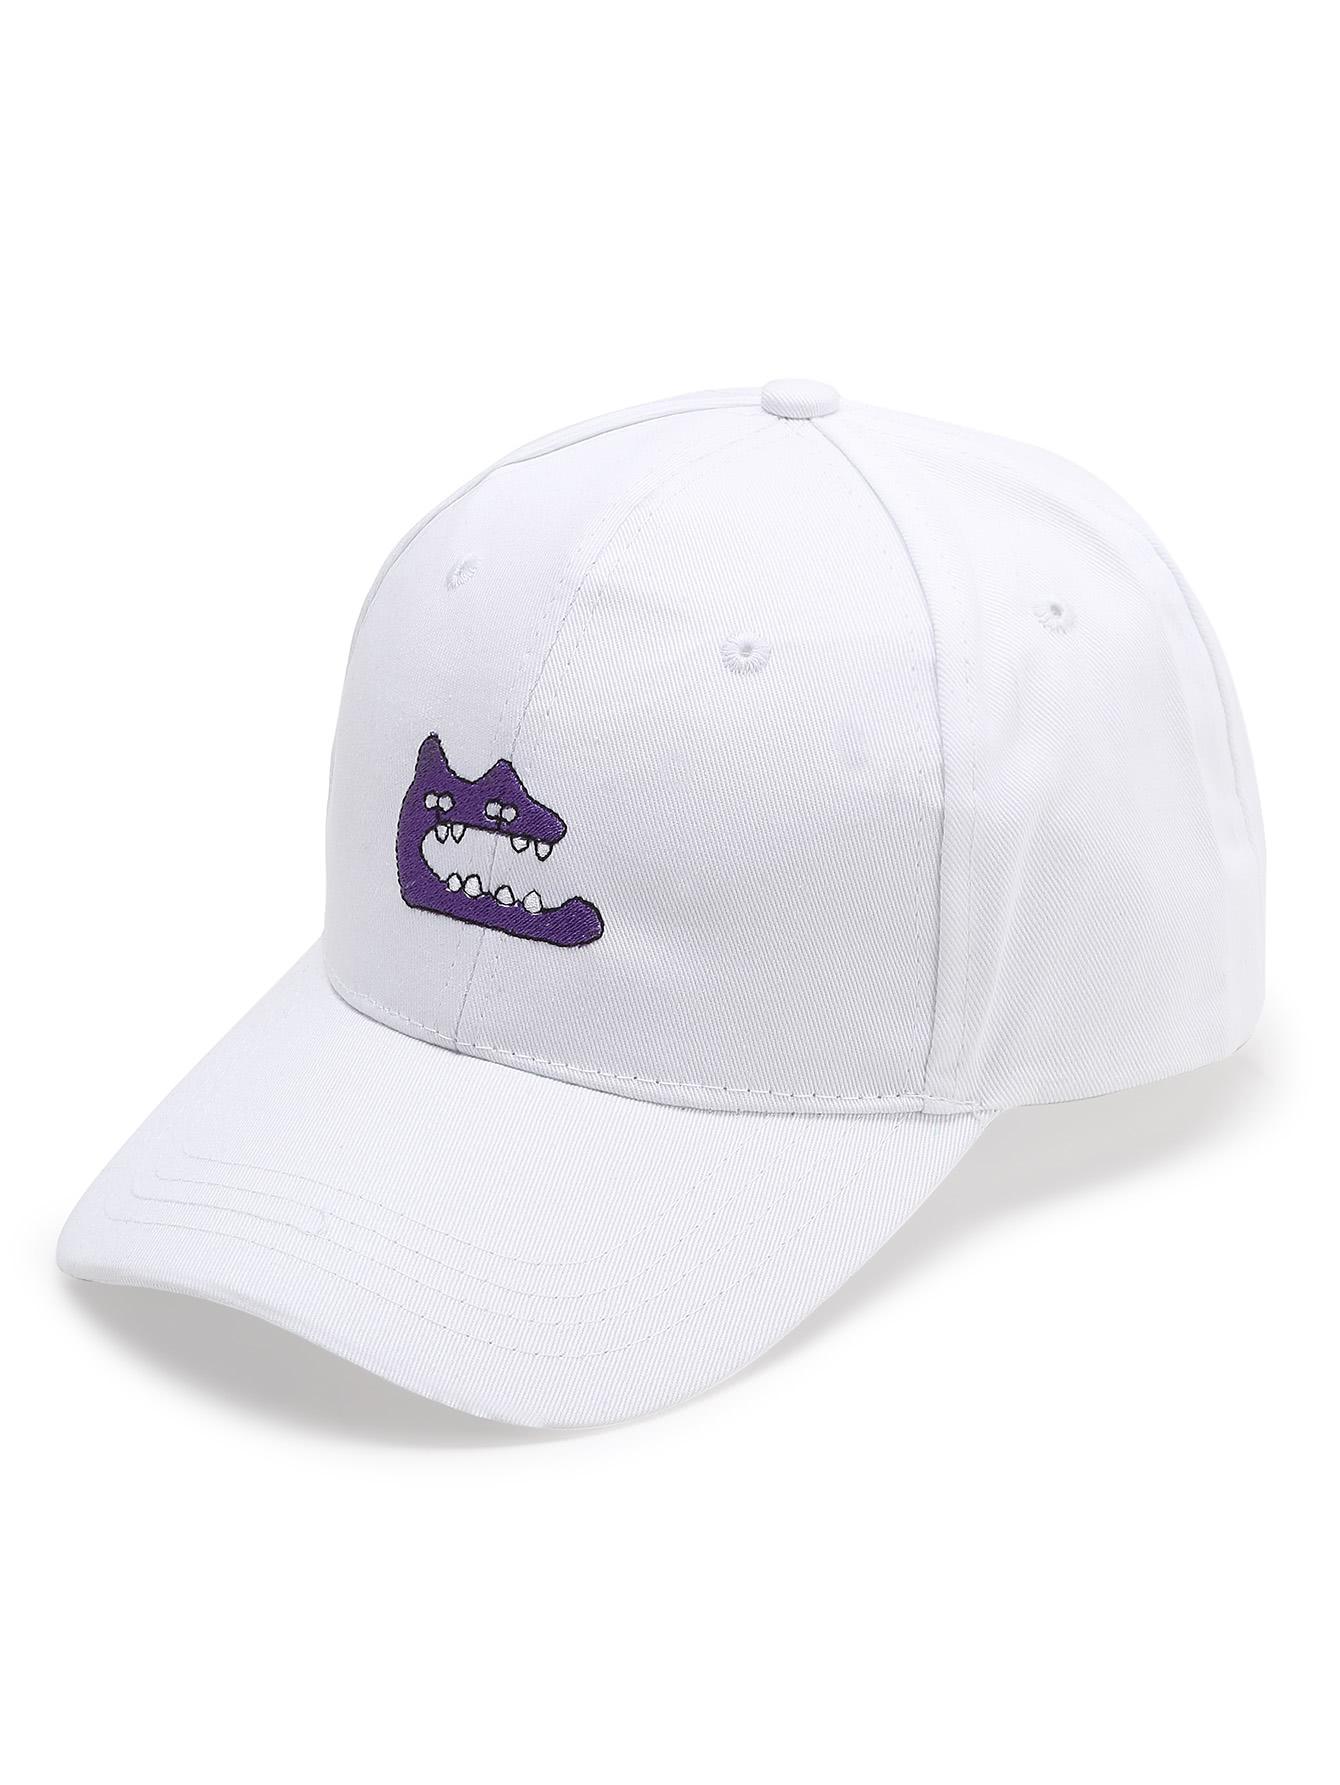 Фото White Embroidery Detail Baseball Hat. Купить с доставкой